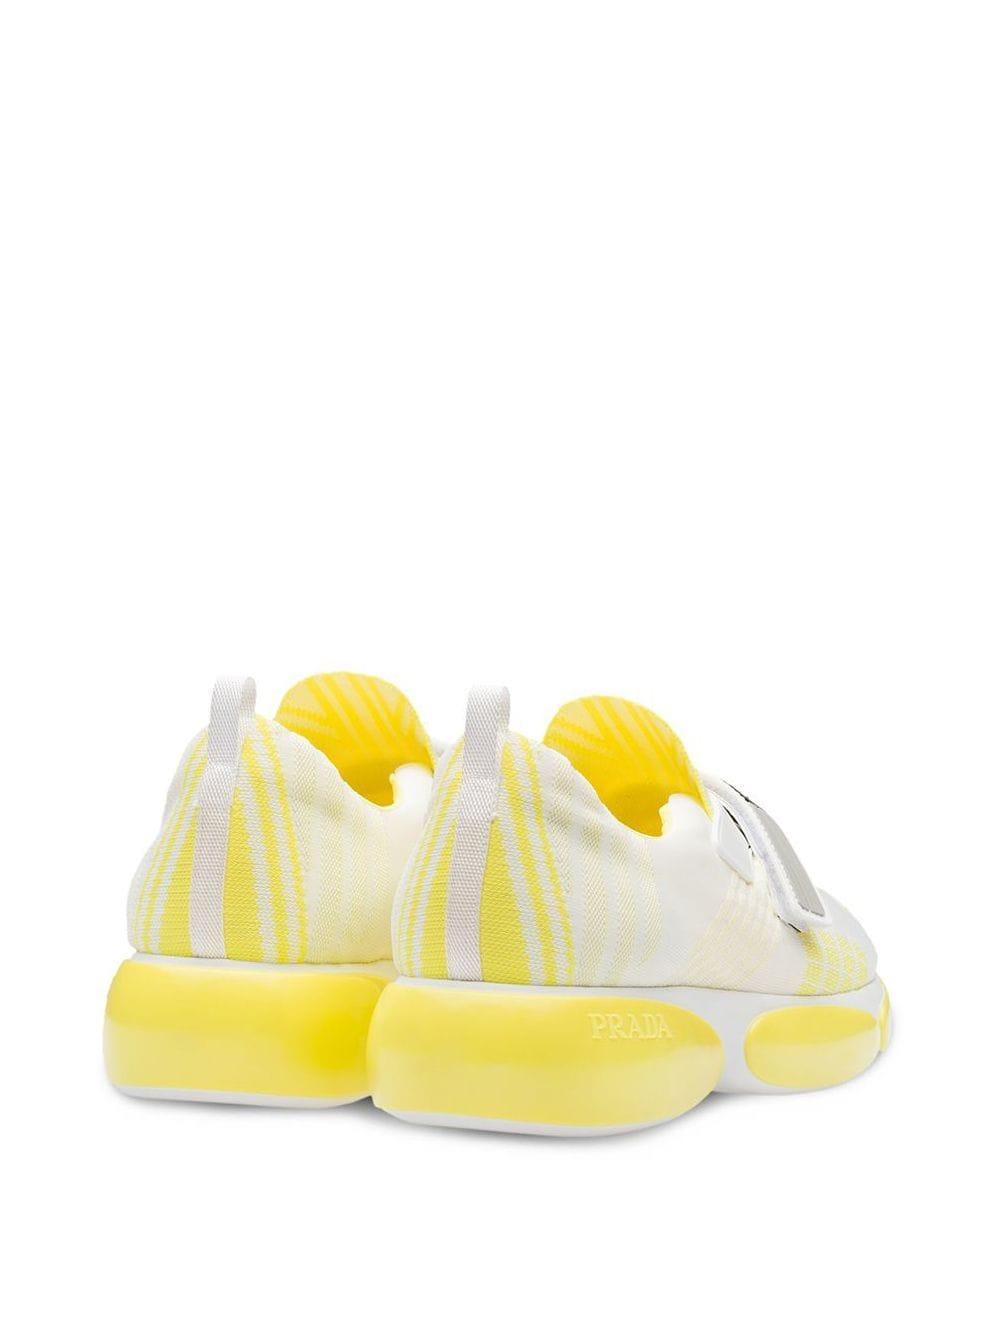 Baskets Cloudbust Néoprène Prada en coloris Blanc AlPU